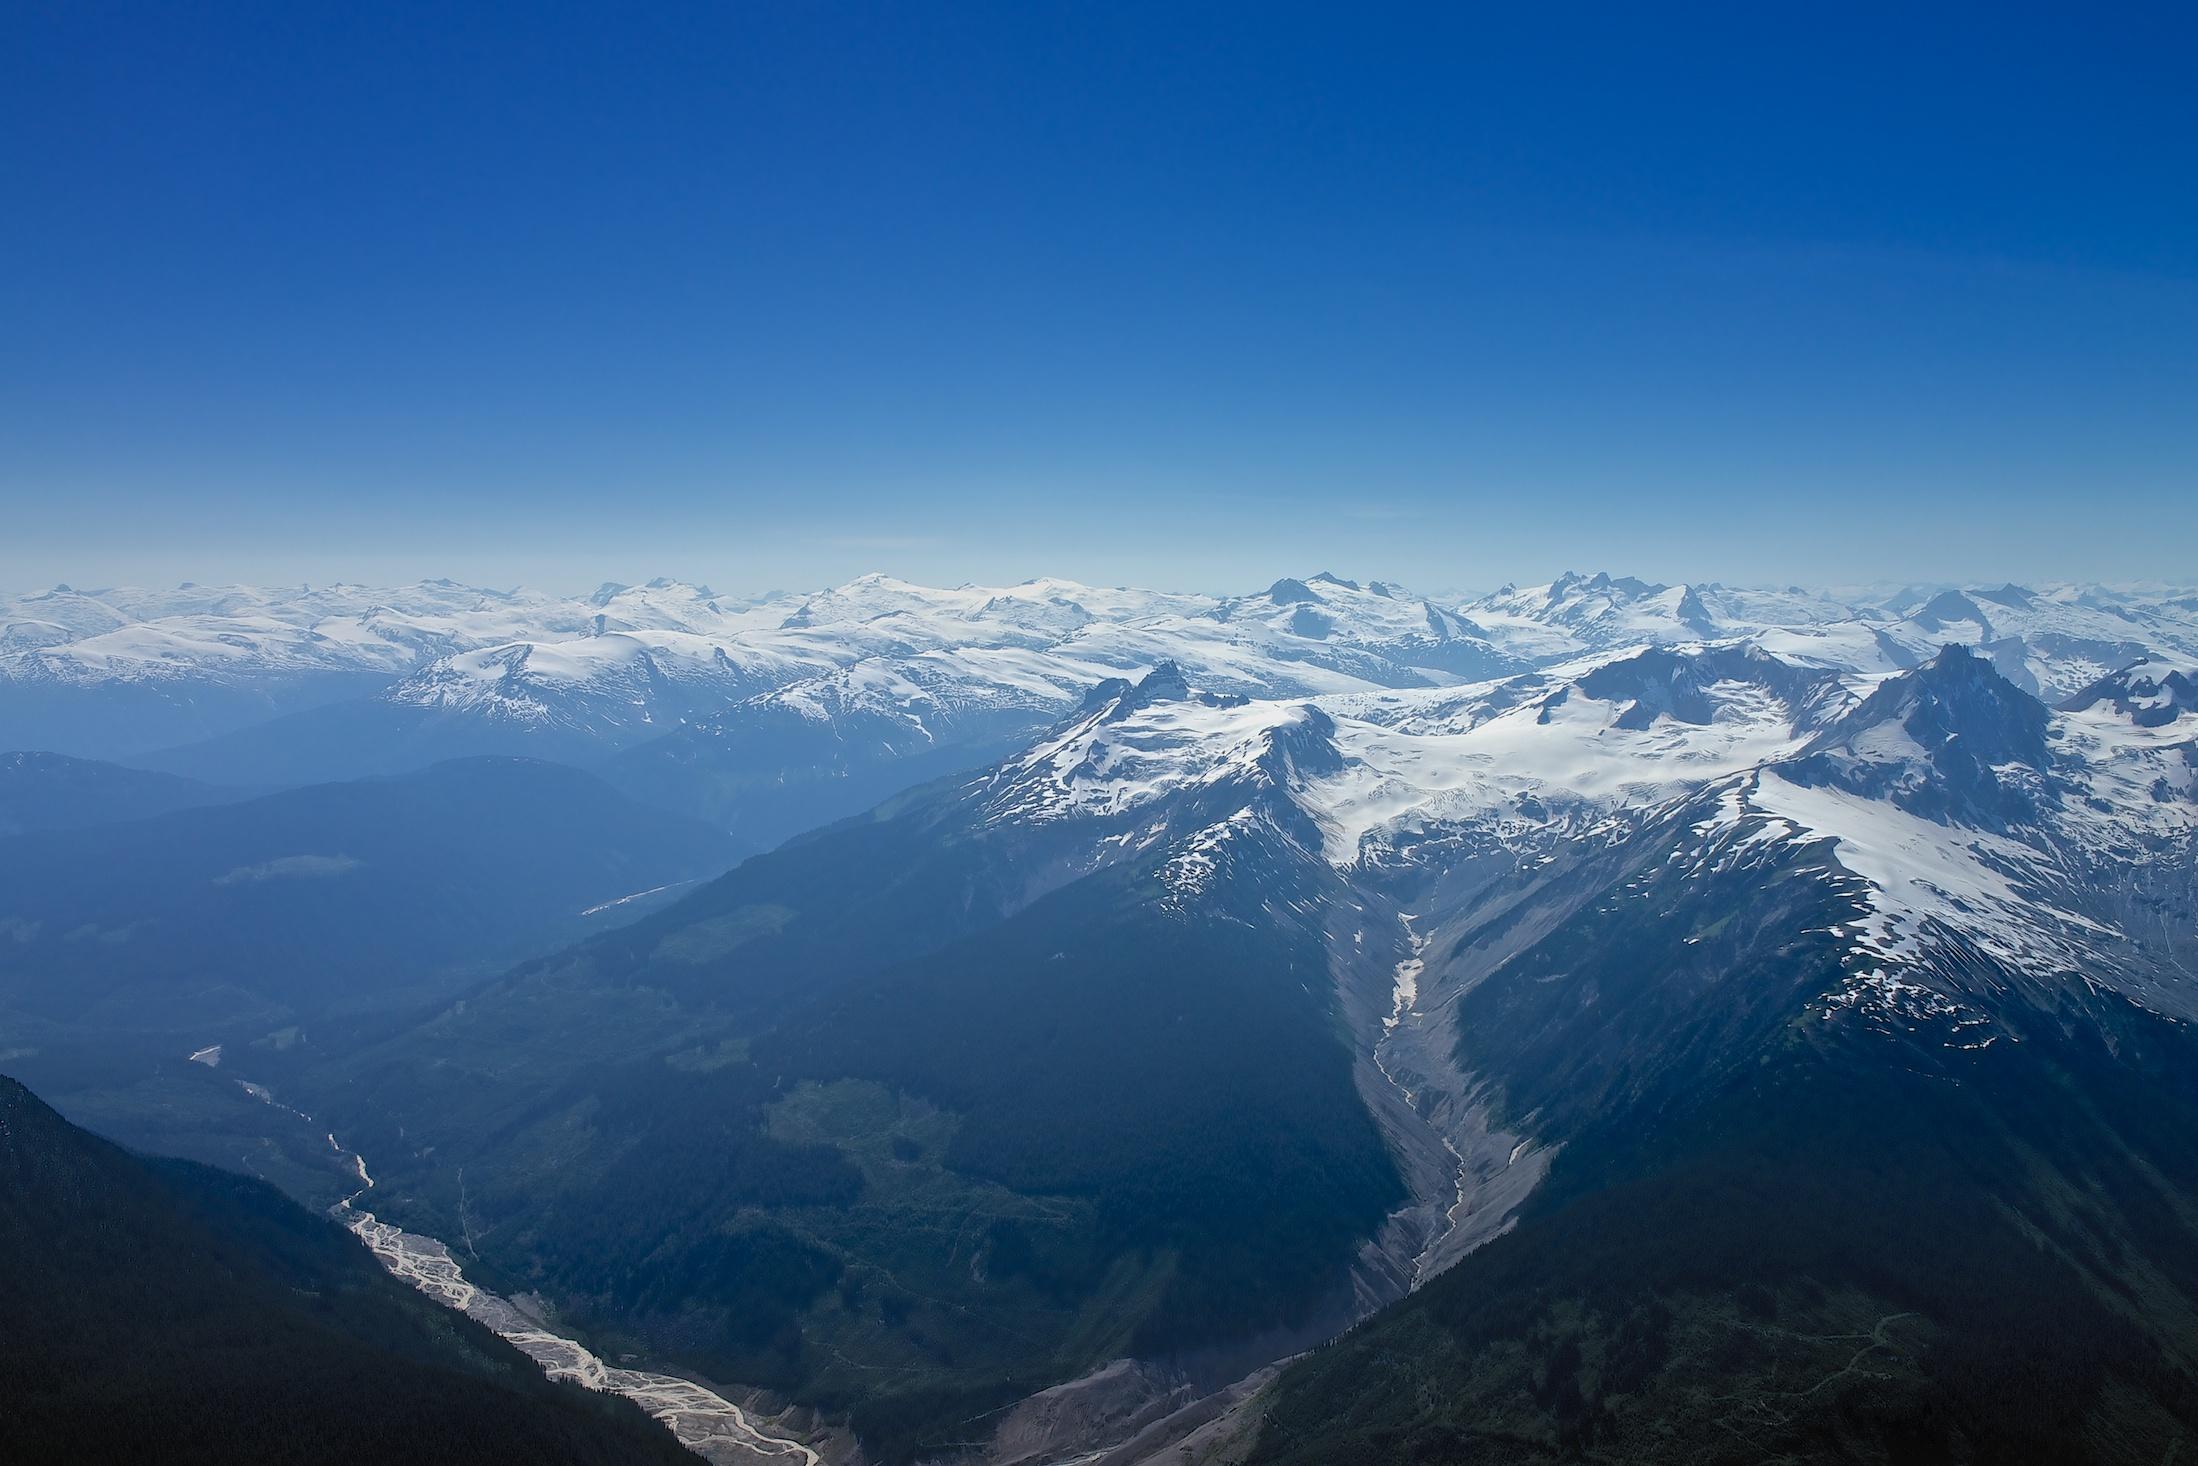 Capricorn Mountain